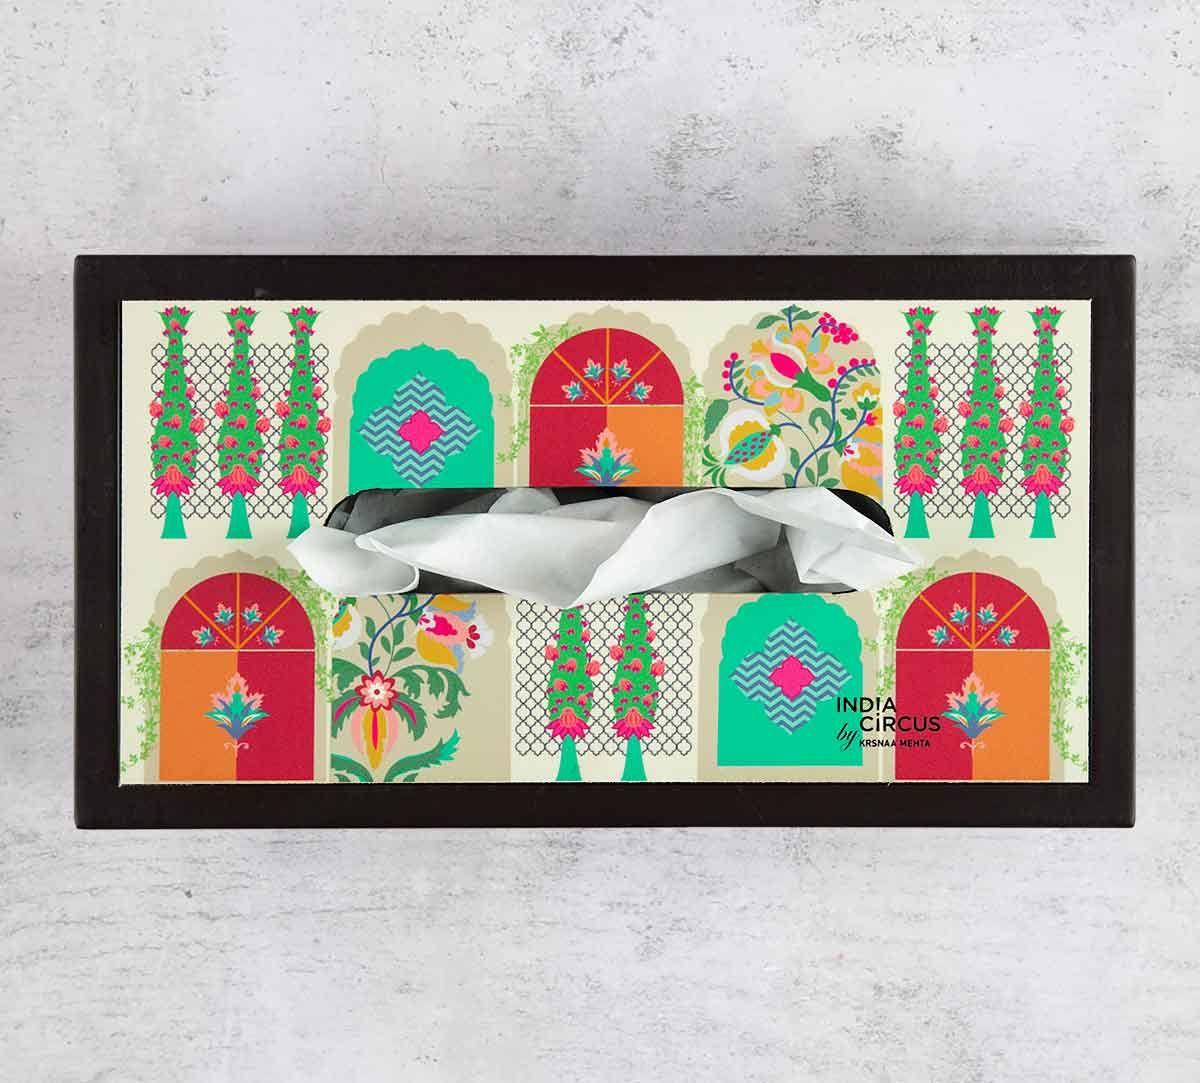 India Circus Doorframe Story MDF Tissue Box Holder